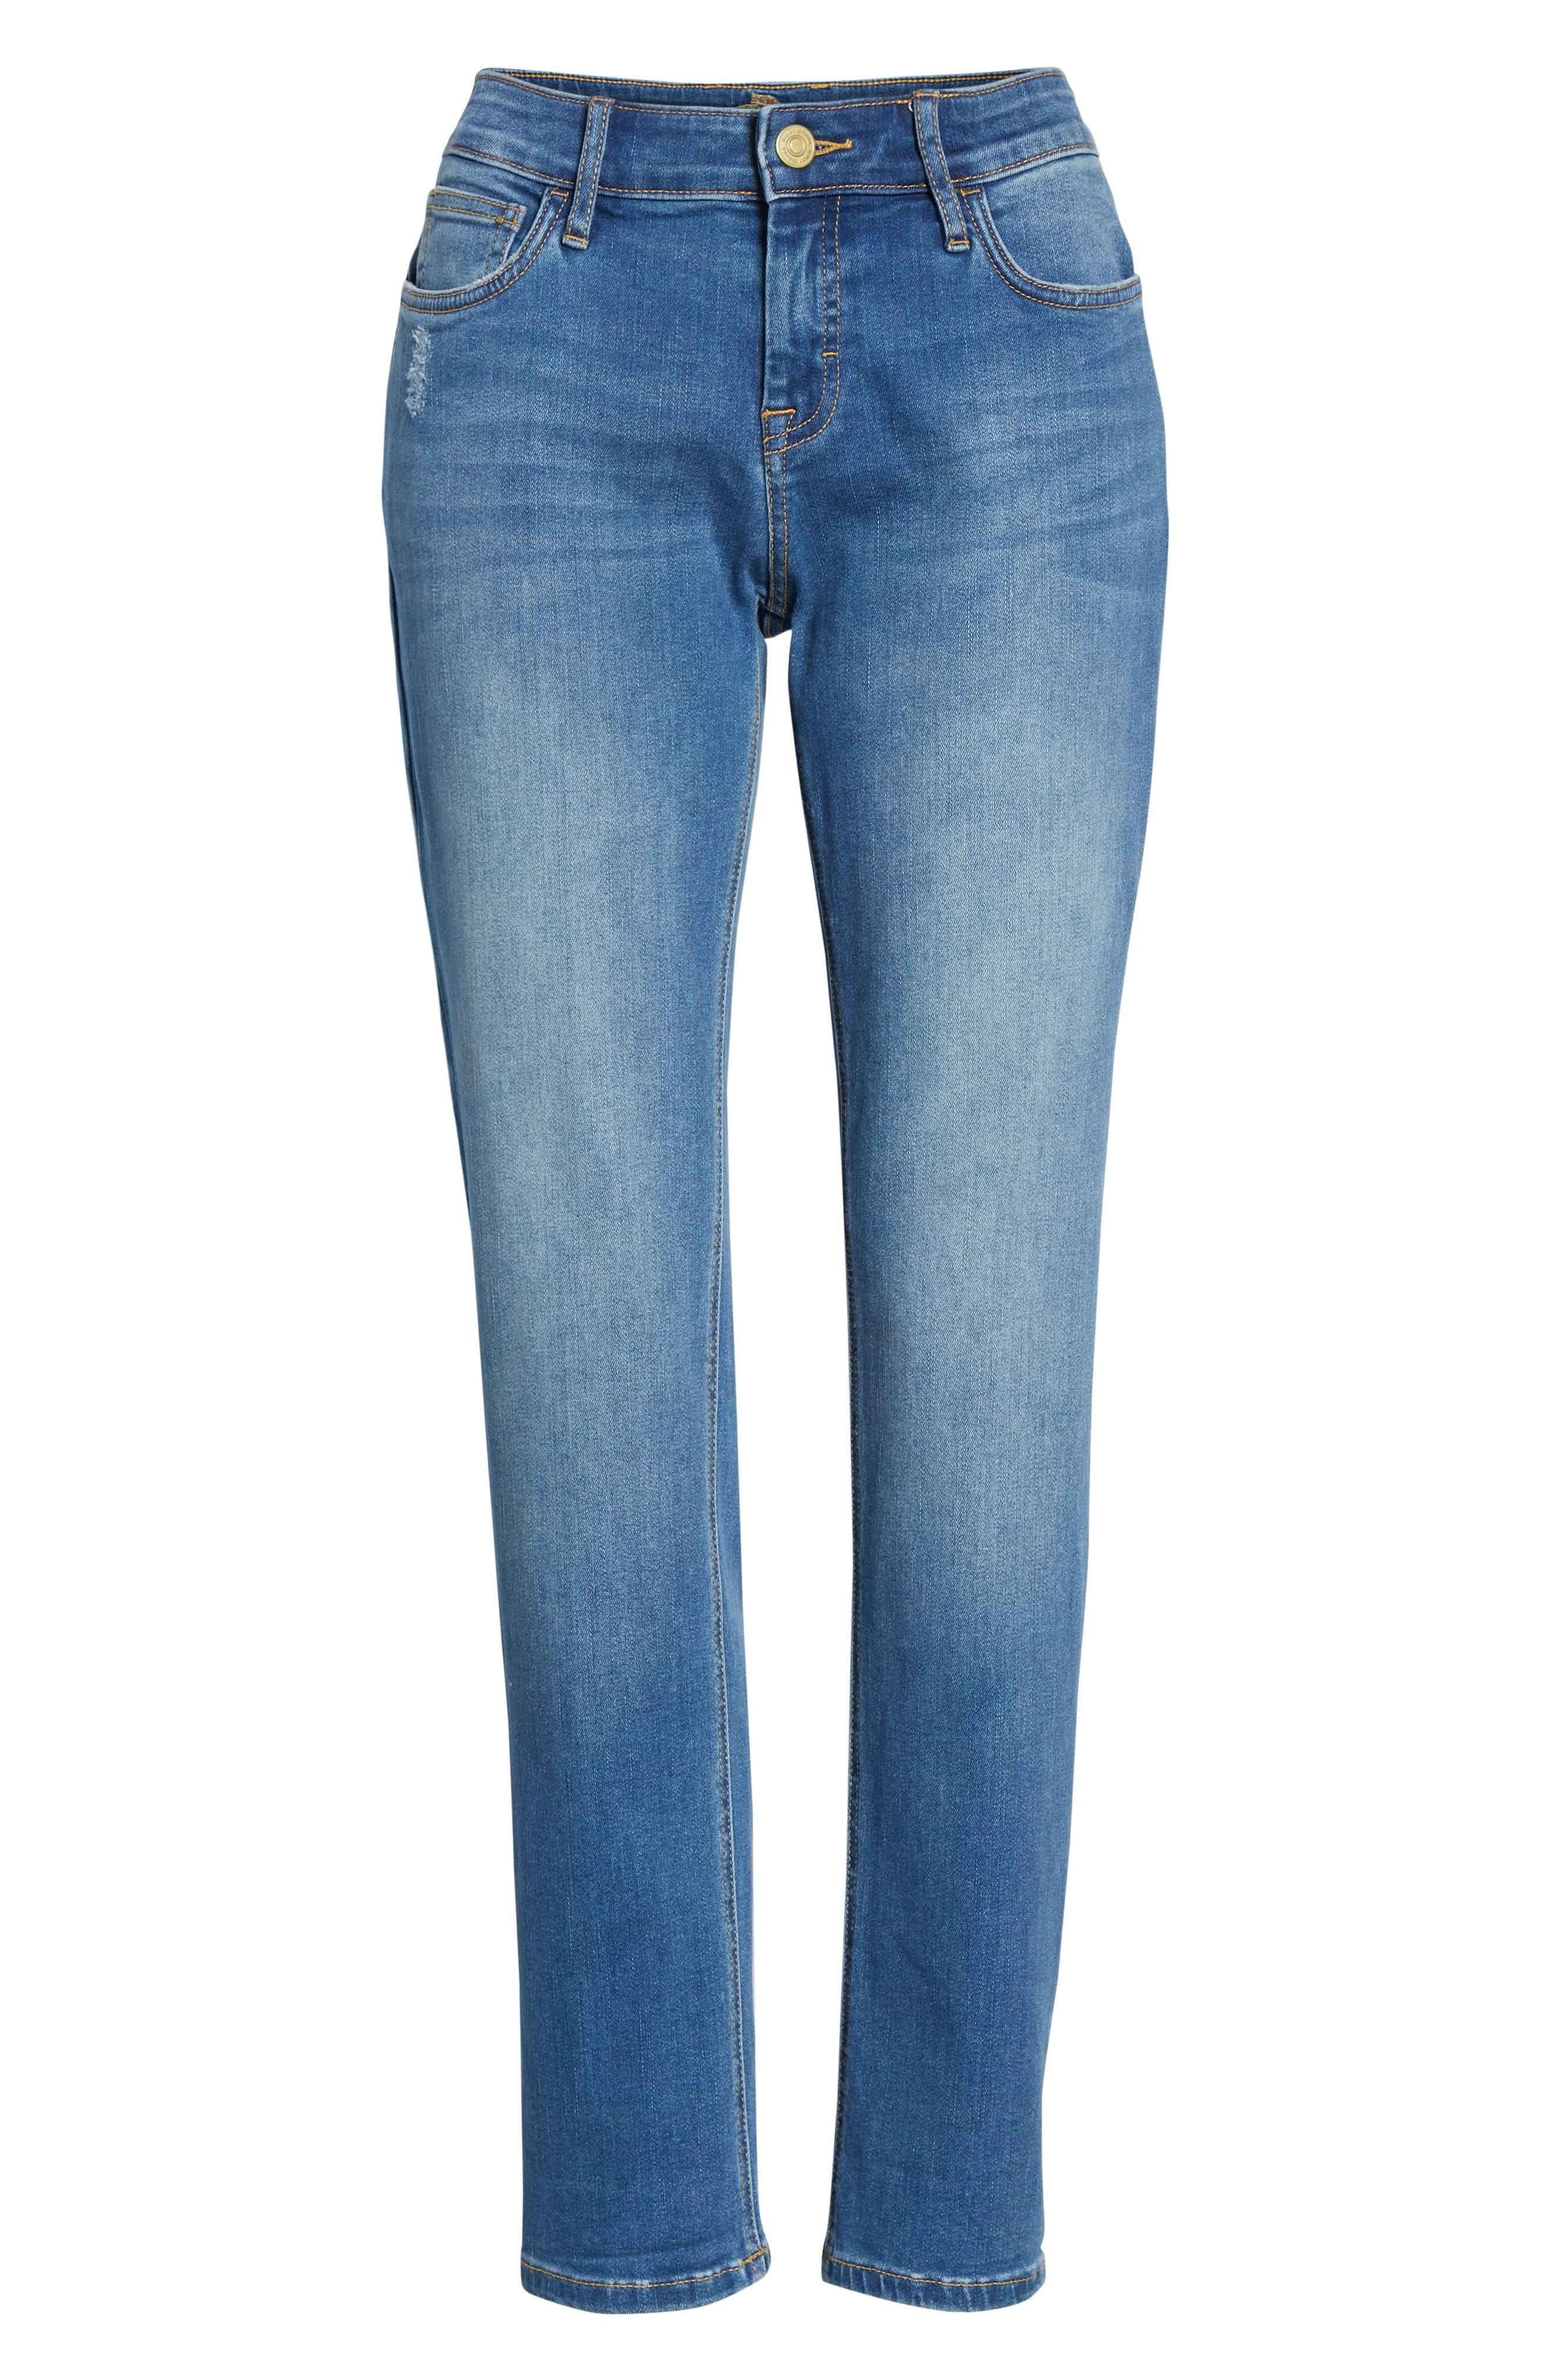 Tema Slim Boyfriend Jeans,                             Alternate thumbnail 7, color,                             407